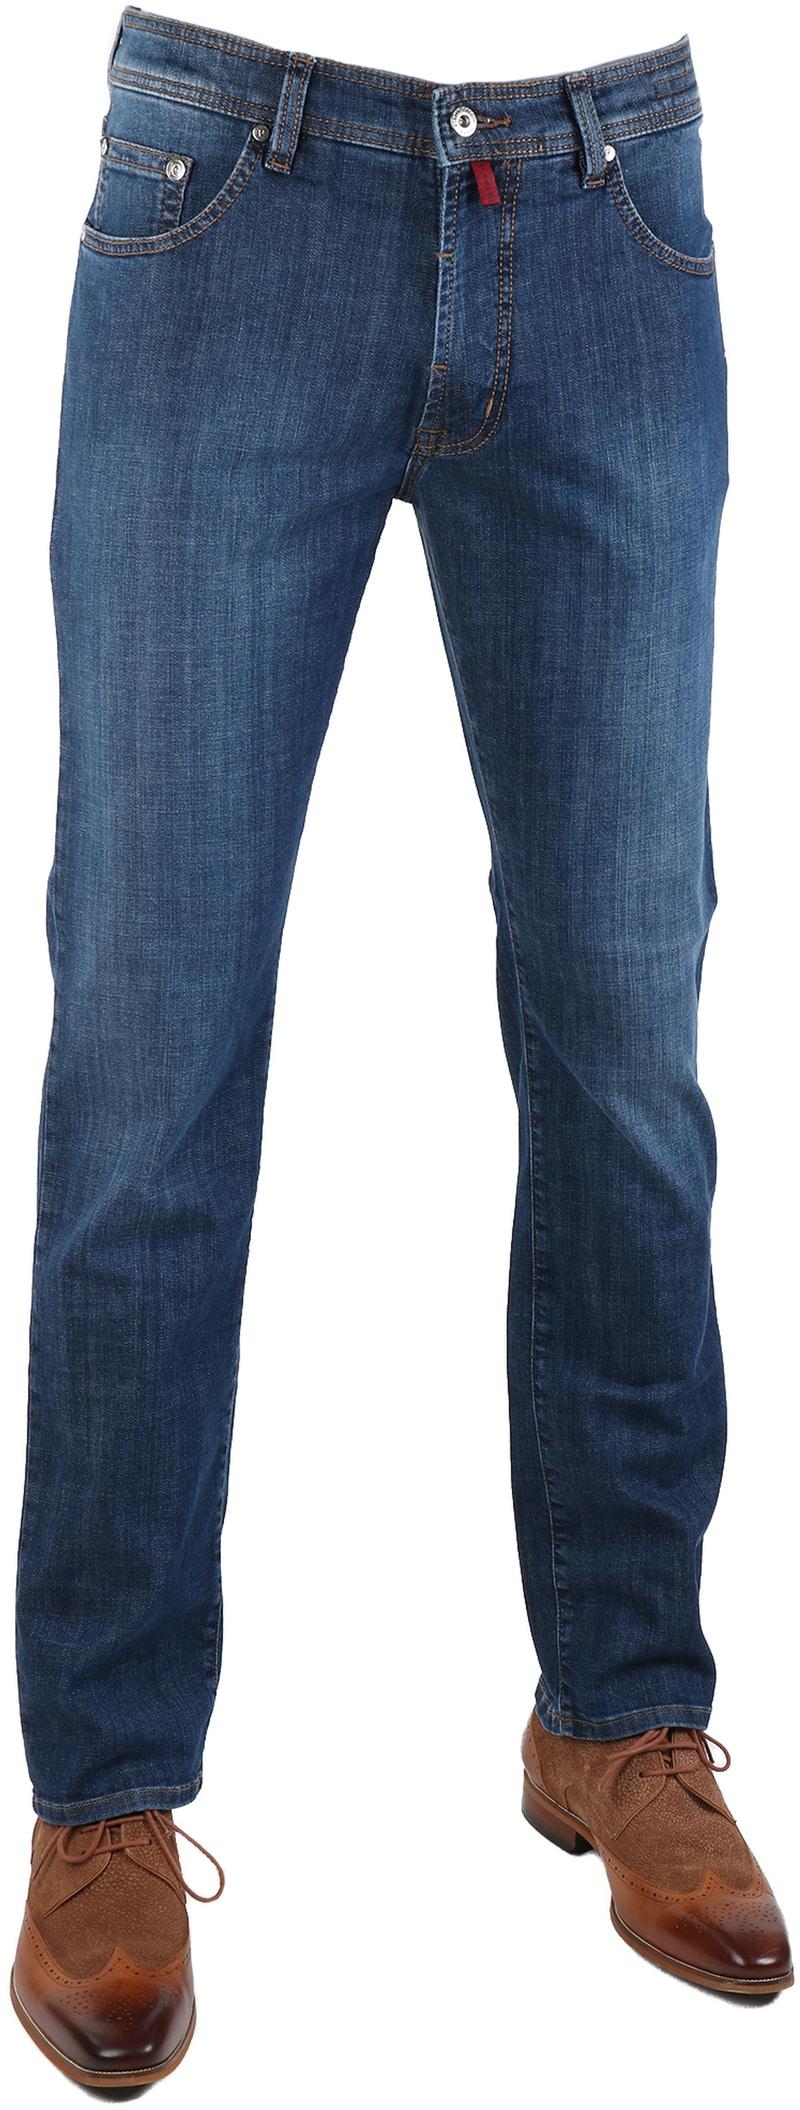 Pierre Cardin Jeans Deauville Stretch 07  online bestellen | Suitable